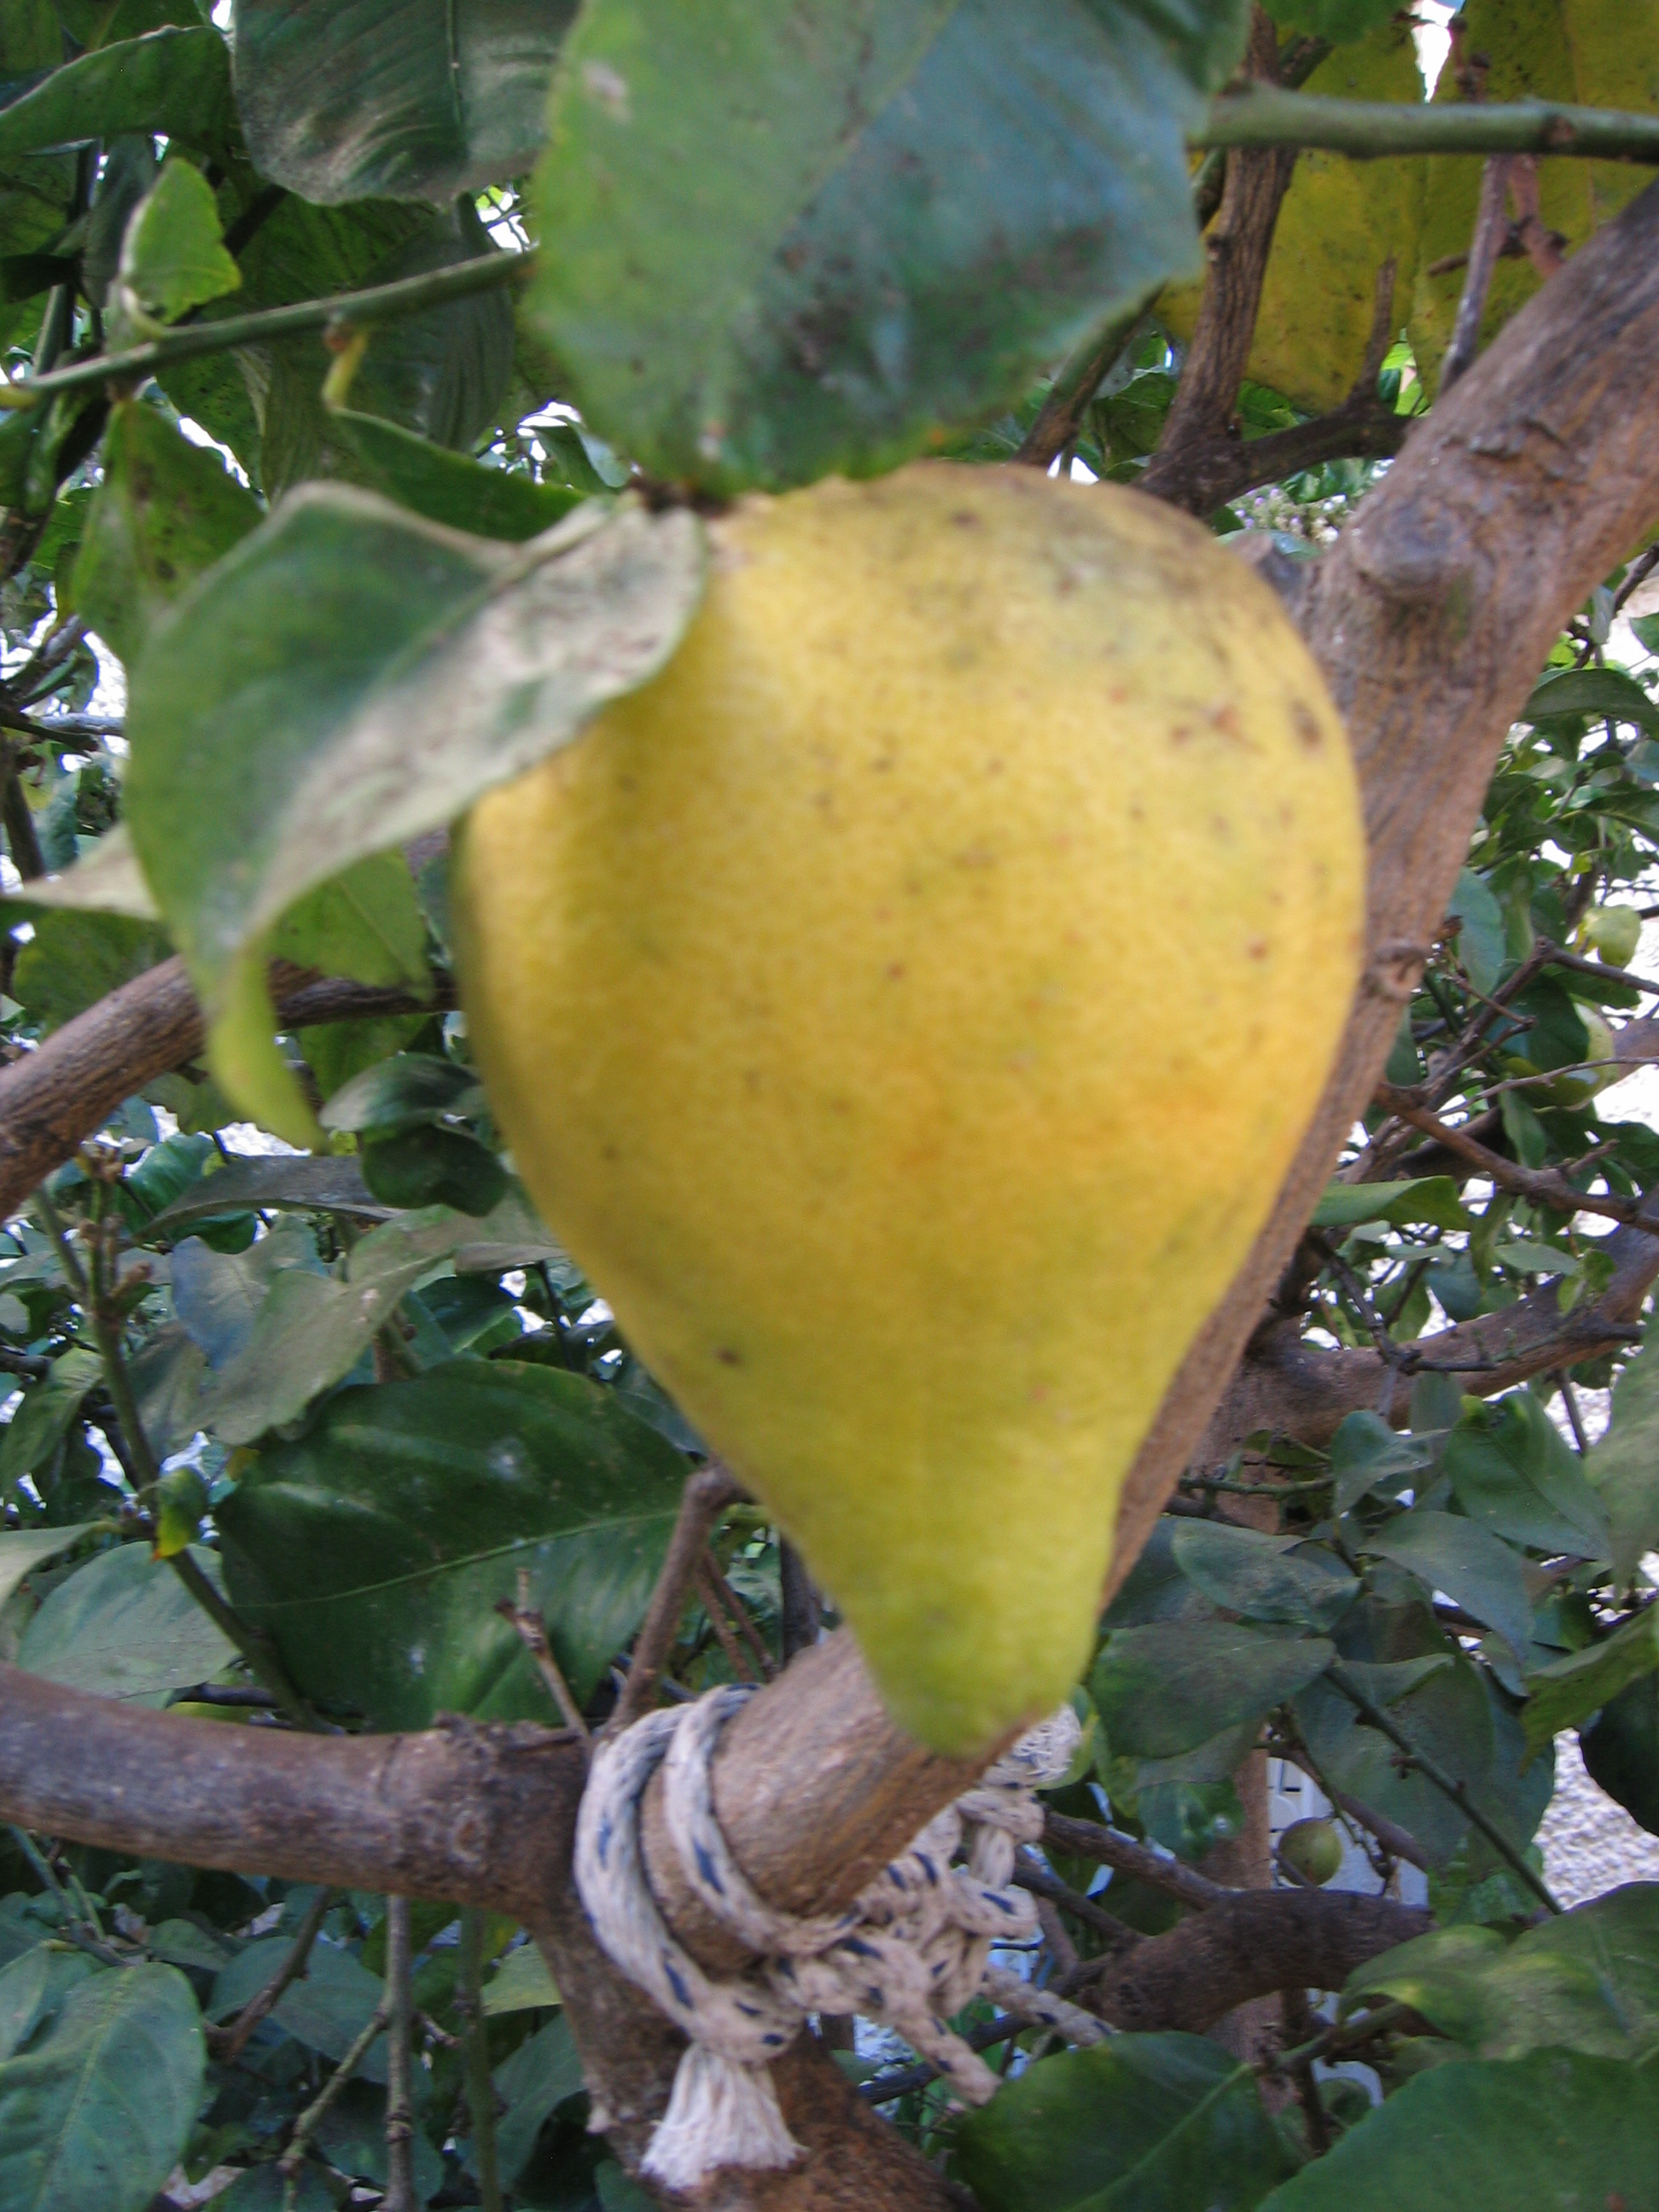 Lemon as Pear | TIMnovate